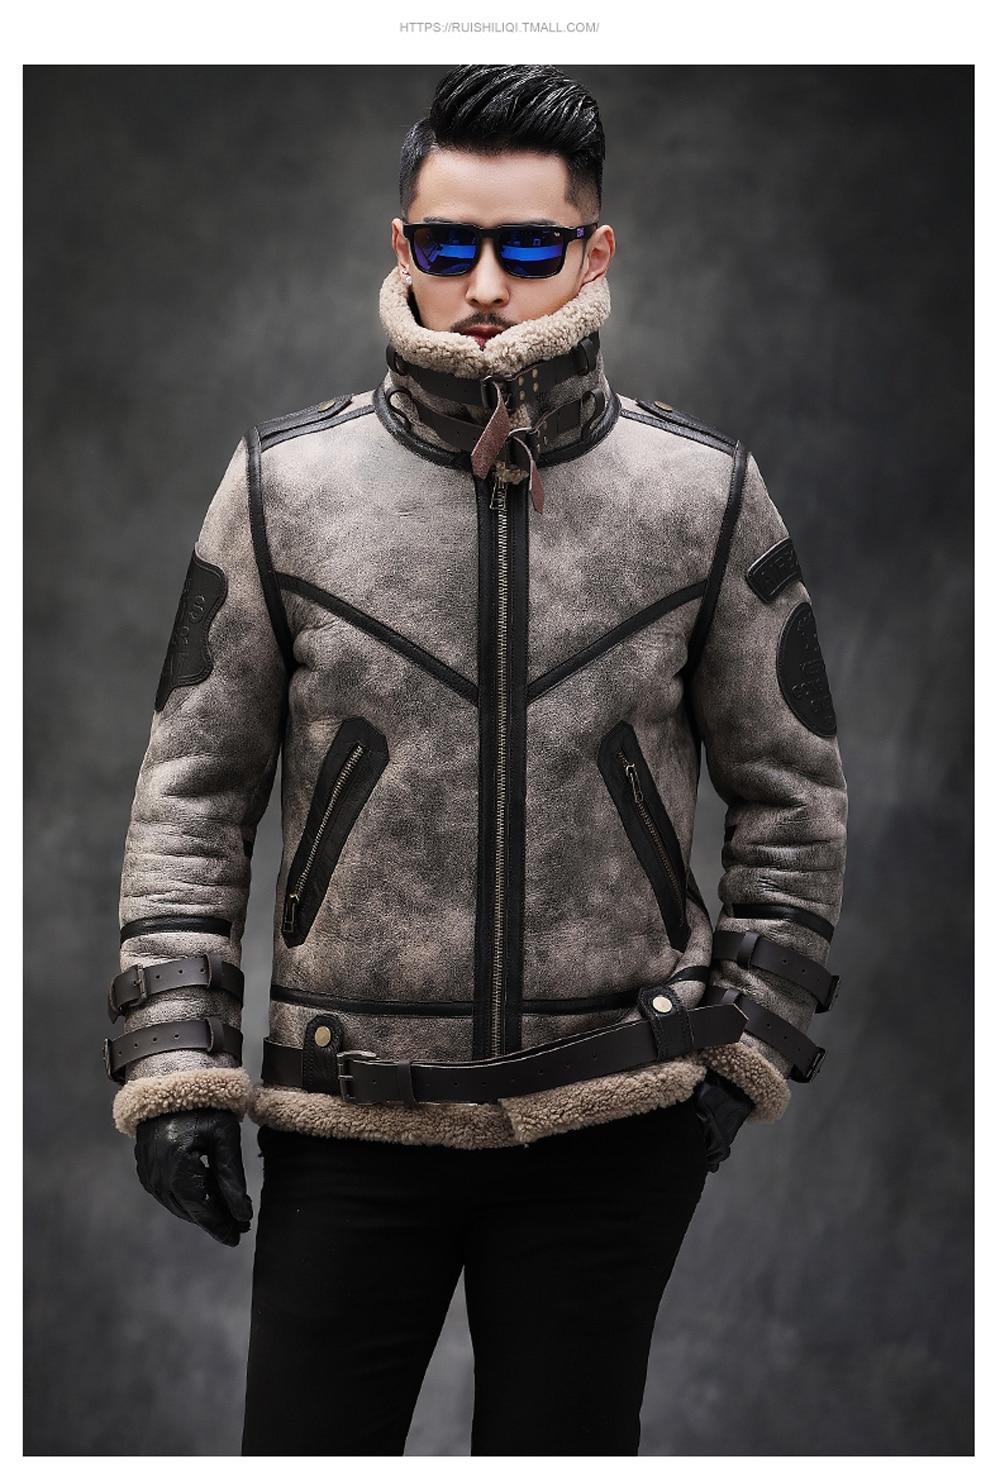 H09967ef979454e85b6abd855715728bcw 2019 Fashion 100% Quality Real Sheepskin Fur Men Coat Genuine Full Pelt Sheep Shearling Male Winter Jacket Brown Men Fur Outwear